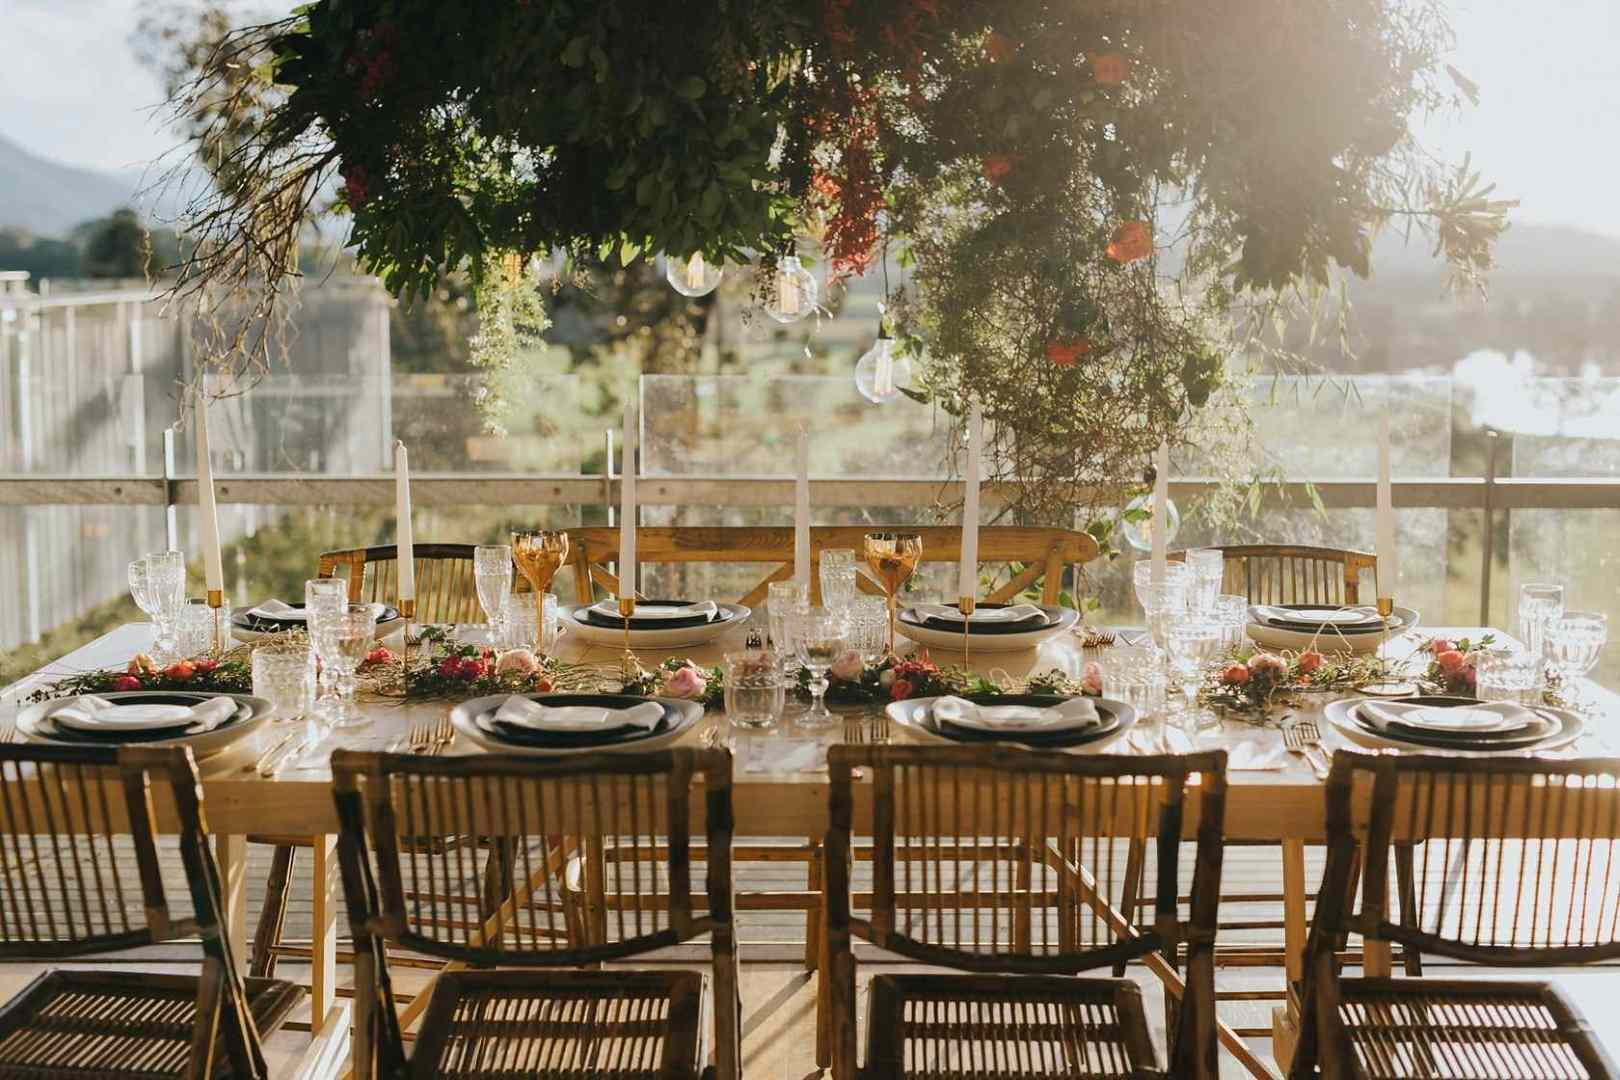 Wedding Venue - Tweed Gallery Cafe 10 on Veilability